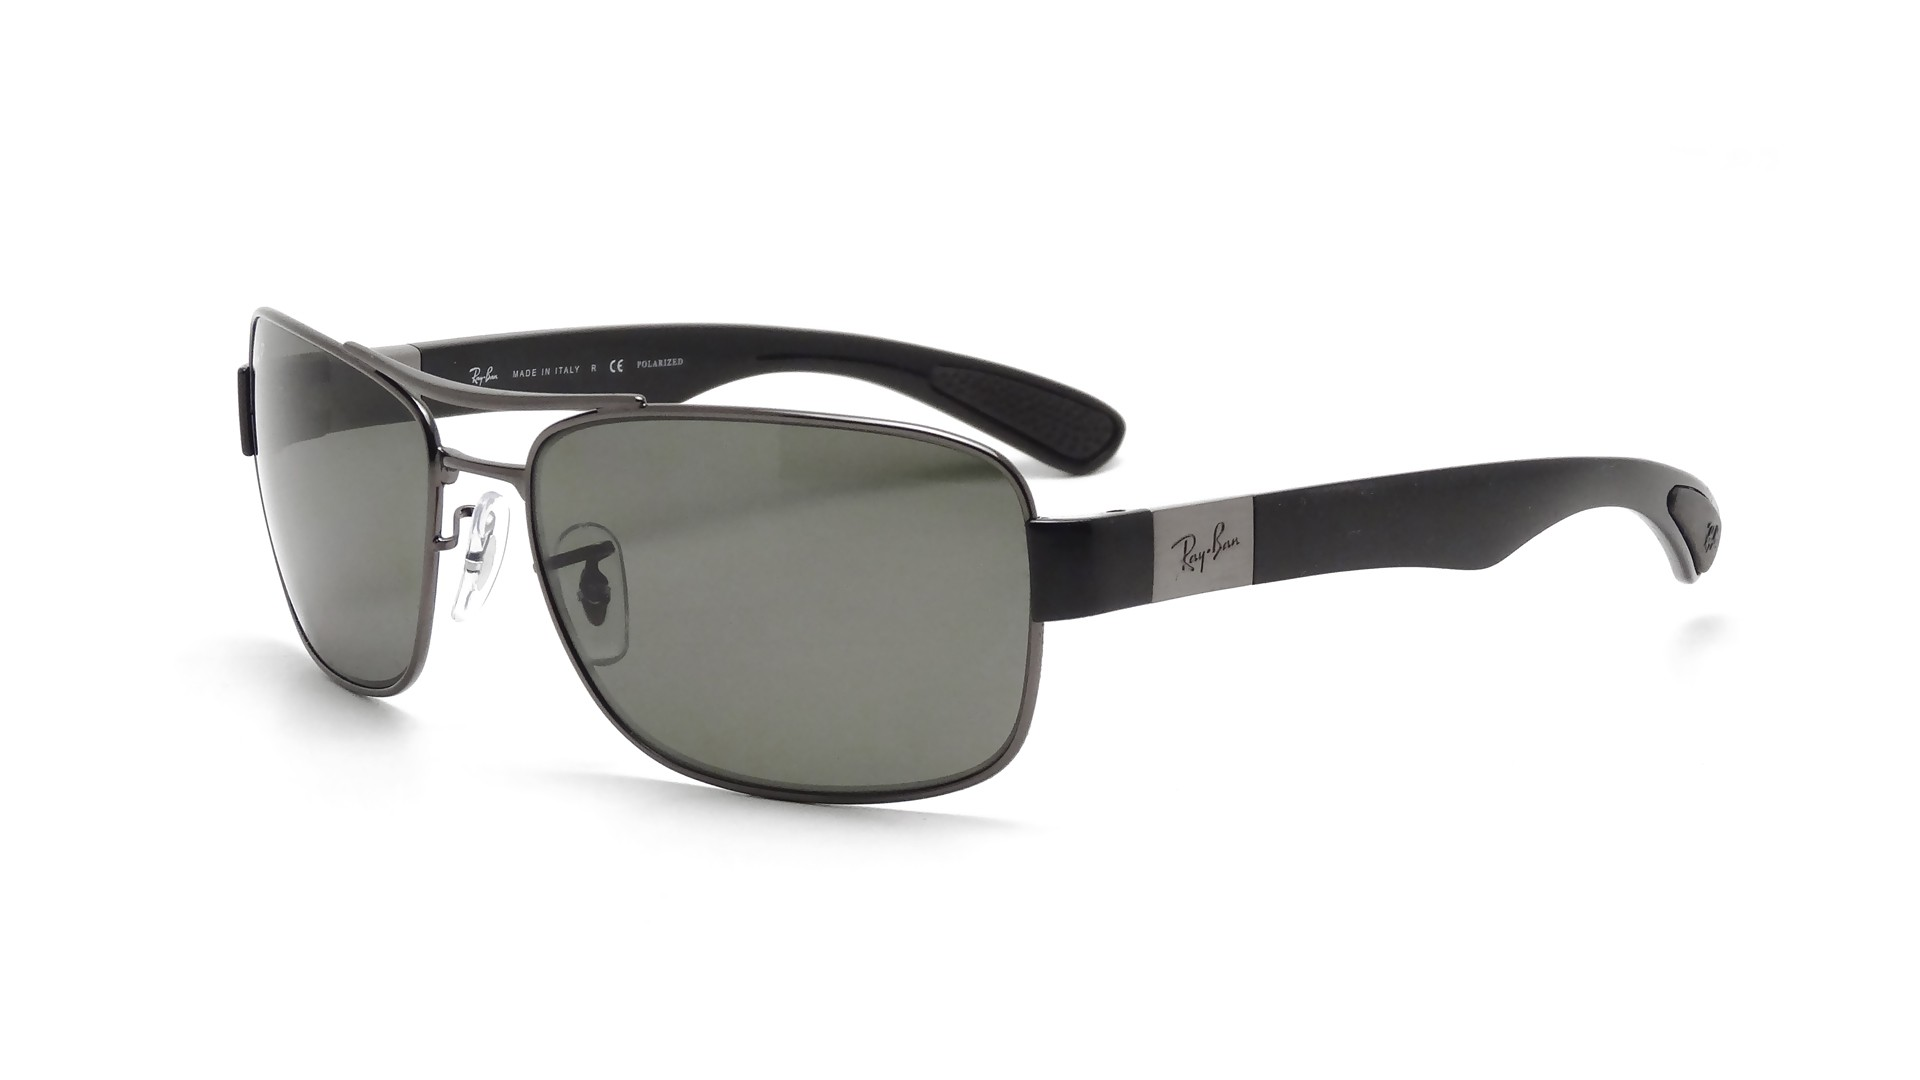 08c96bf495 Sunglasses Ray-Ban RB3522 004 9A 61-17 Grey Medium Polarized